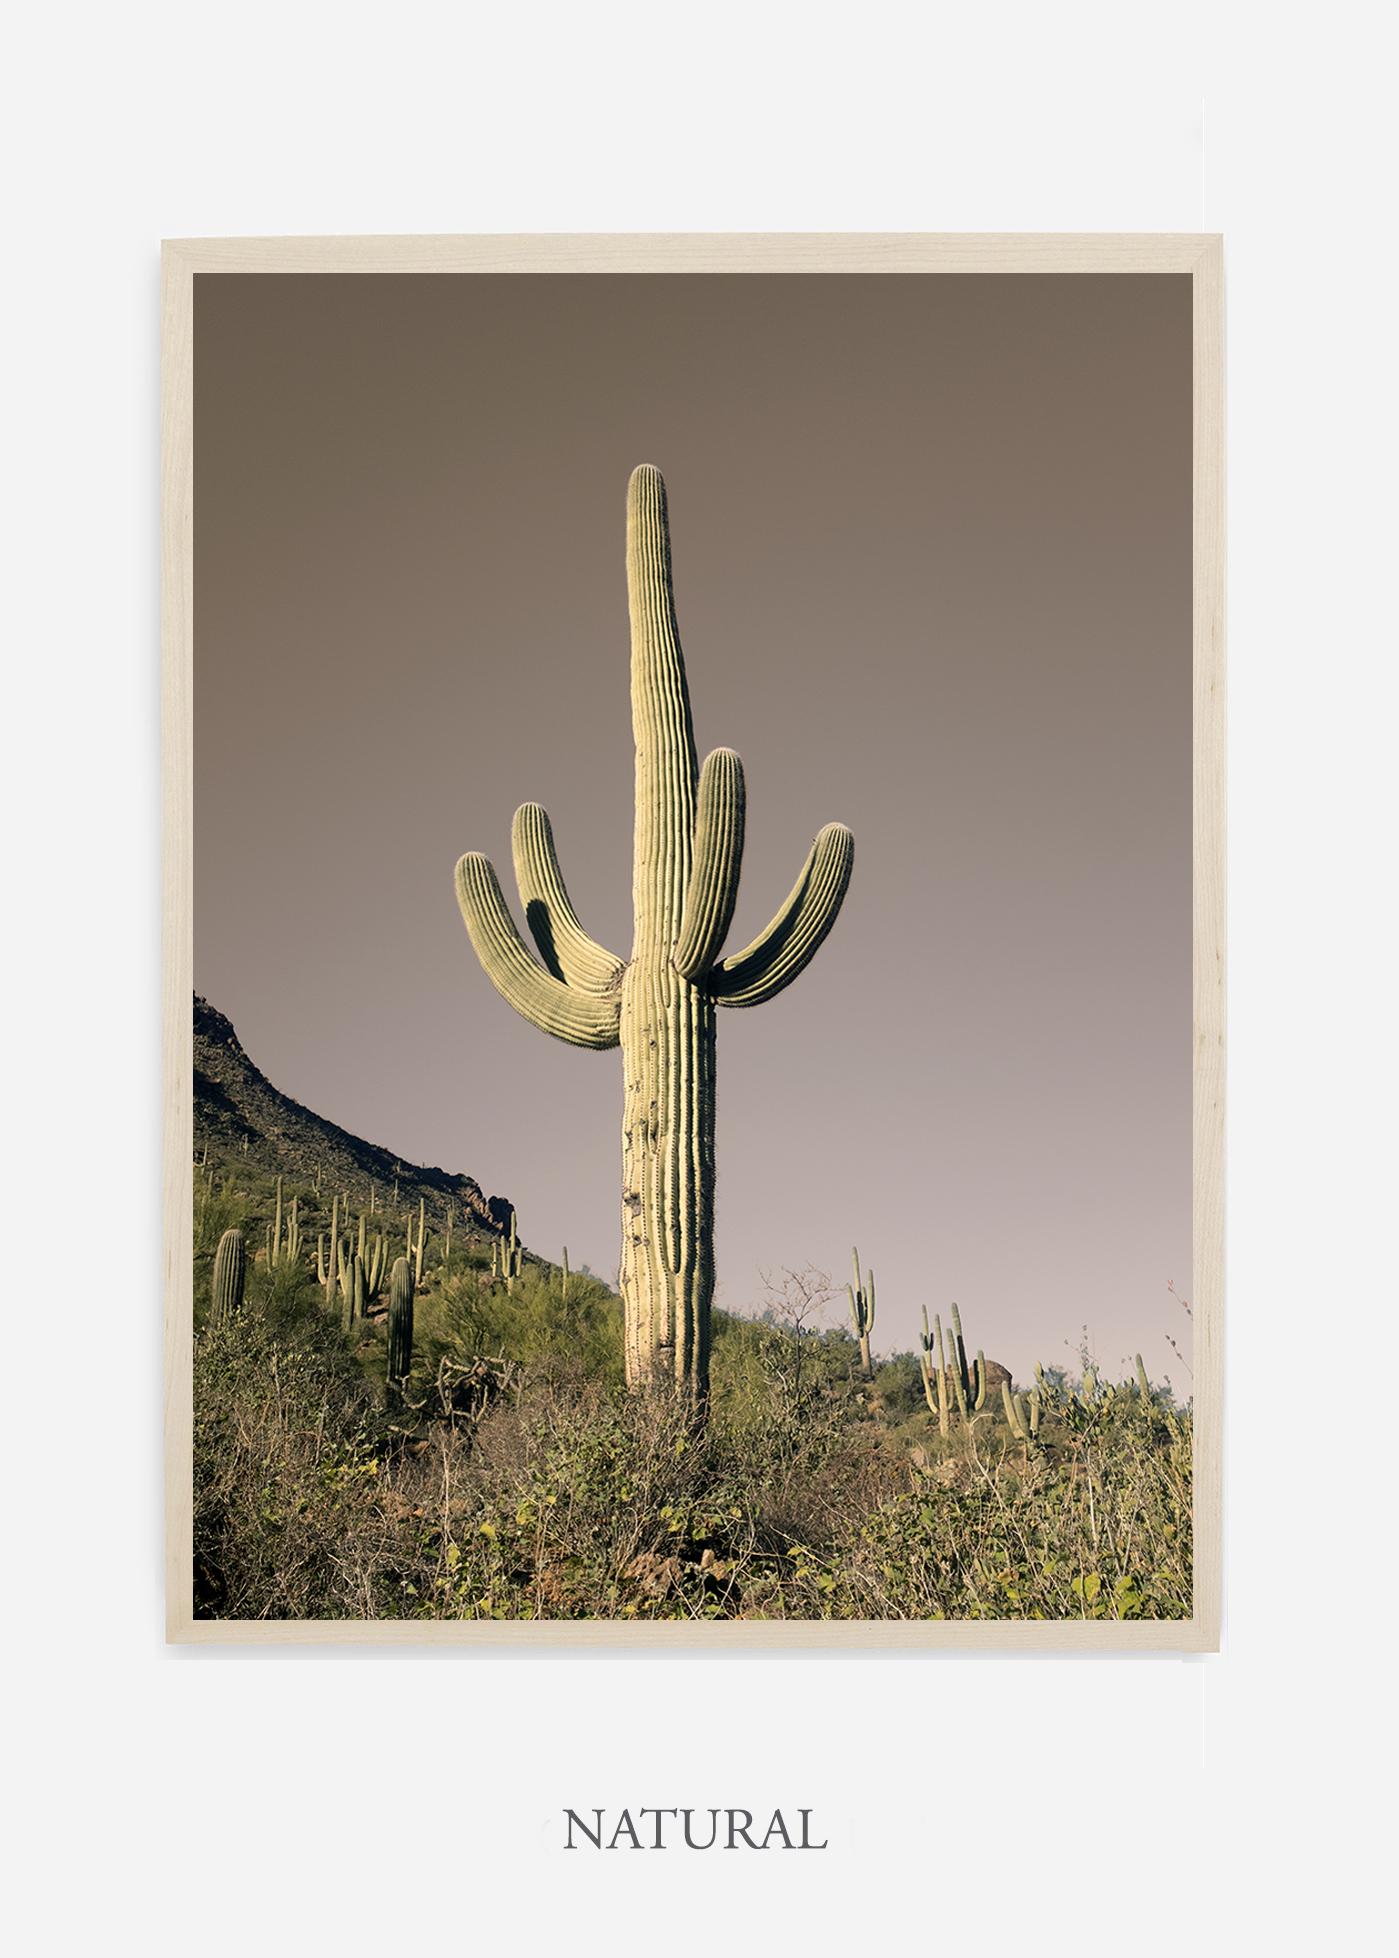 nomat-naturalframe-saguaroNo.20-wildercalifornia-art-wallart-cactusprint-homedecor-prints-arizona-botanical-artwork-interiordesign.jpg